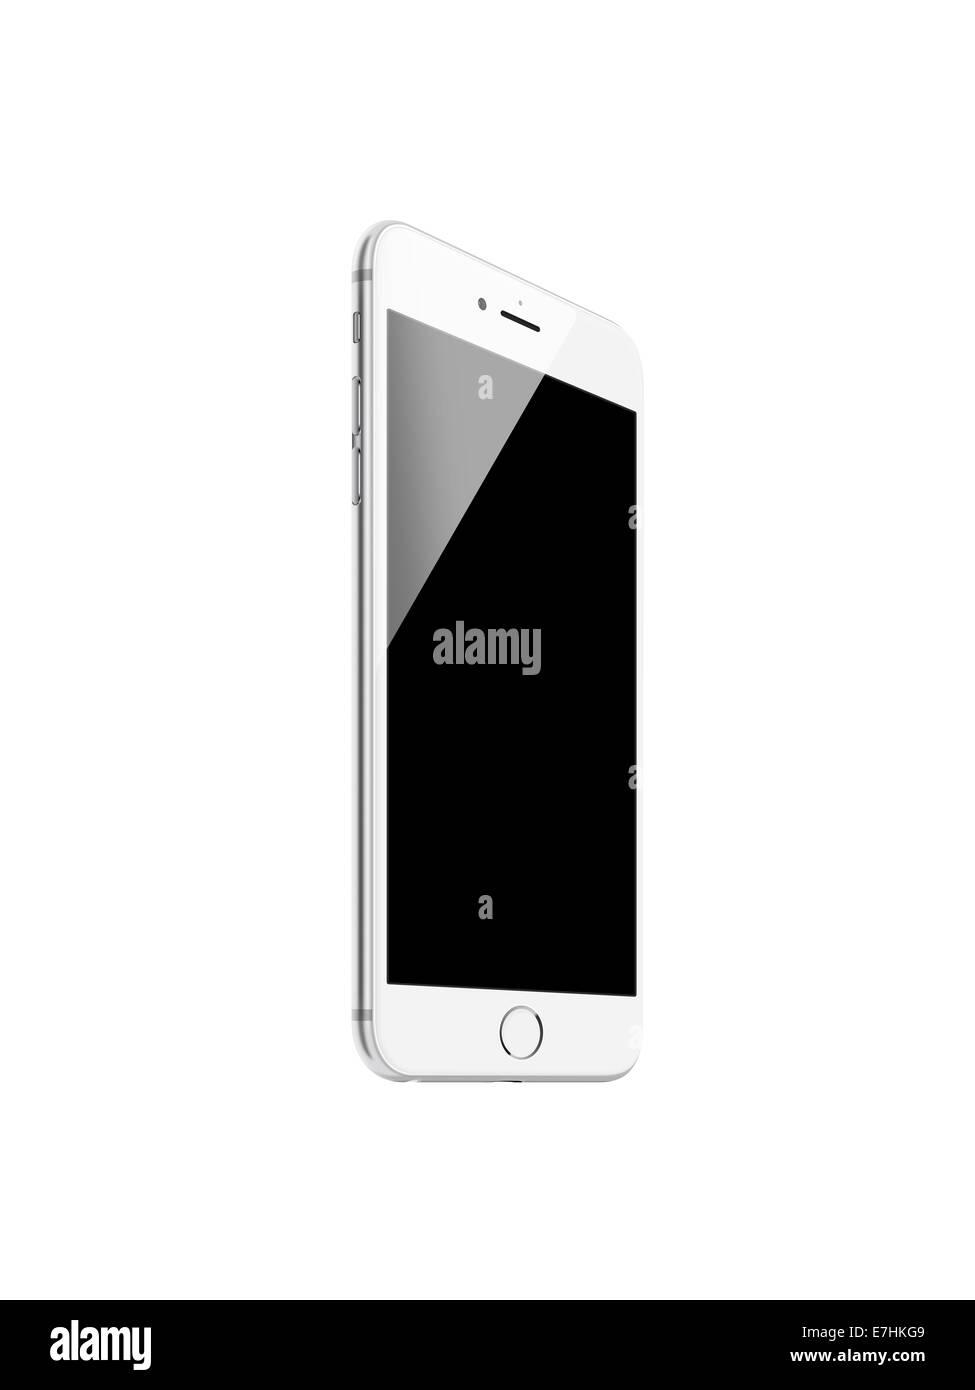 Smart phone iphone 6 (silver), digitally generated artwork. - Stock Image